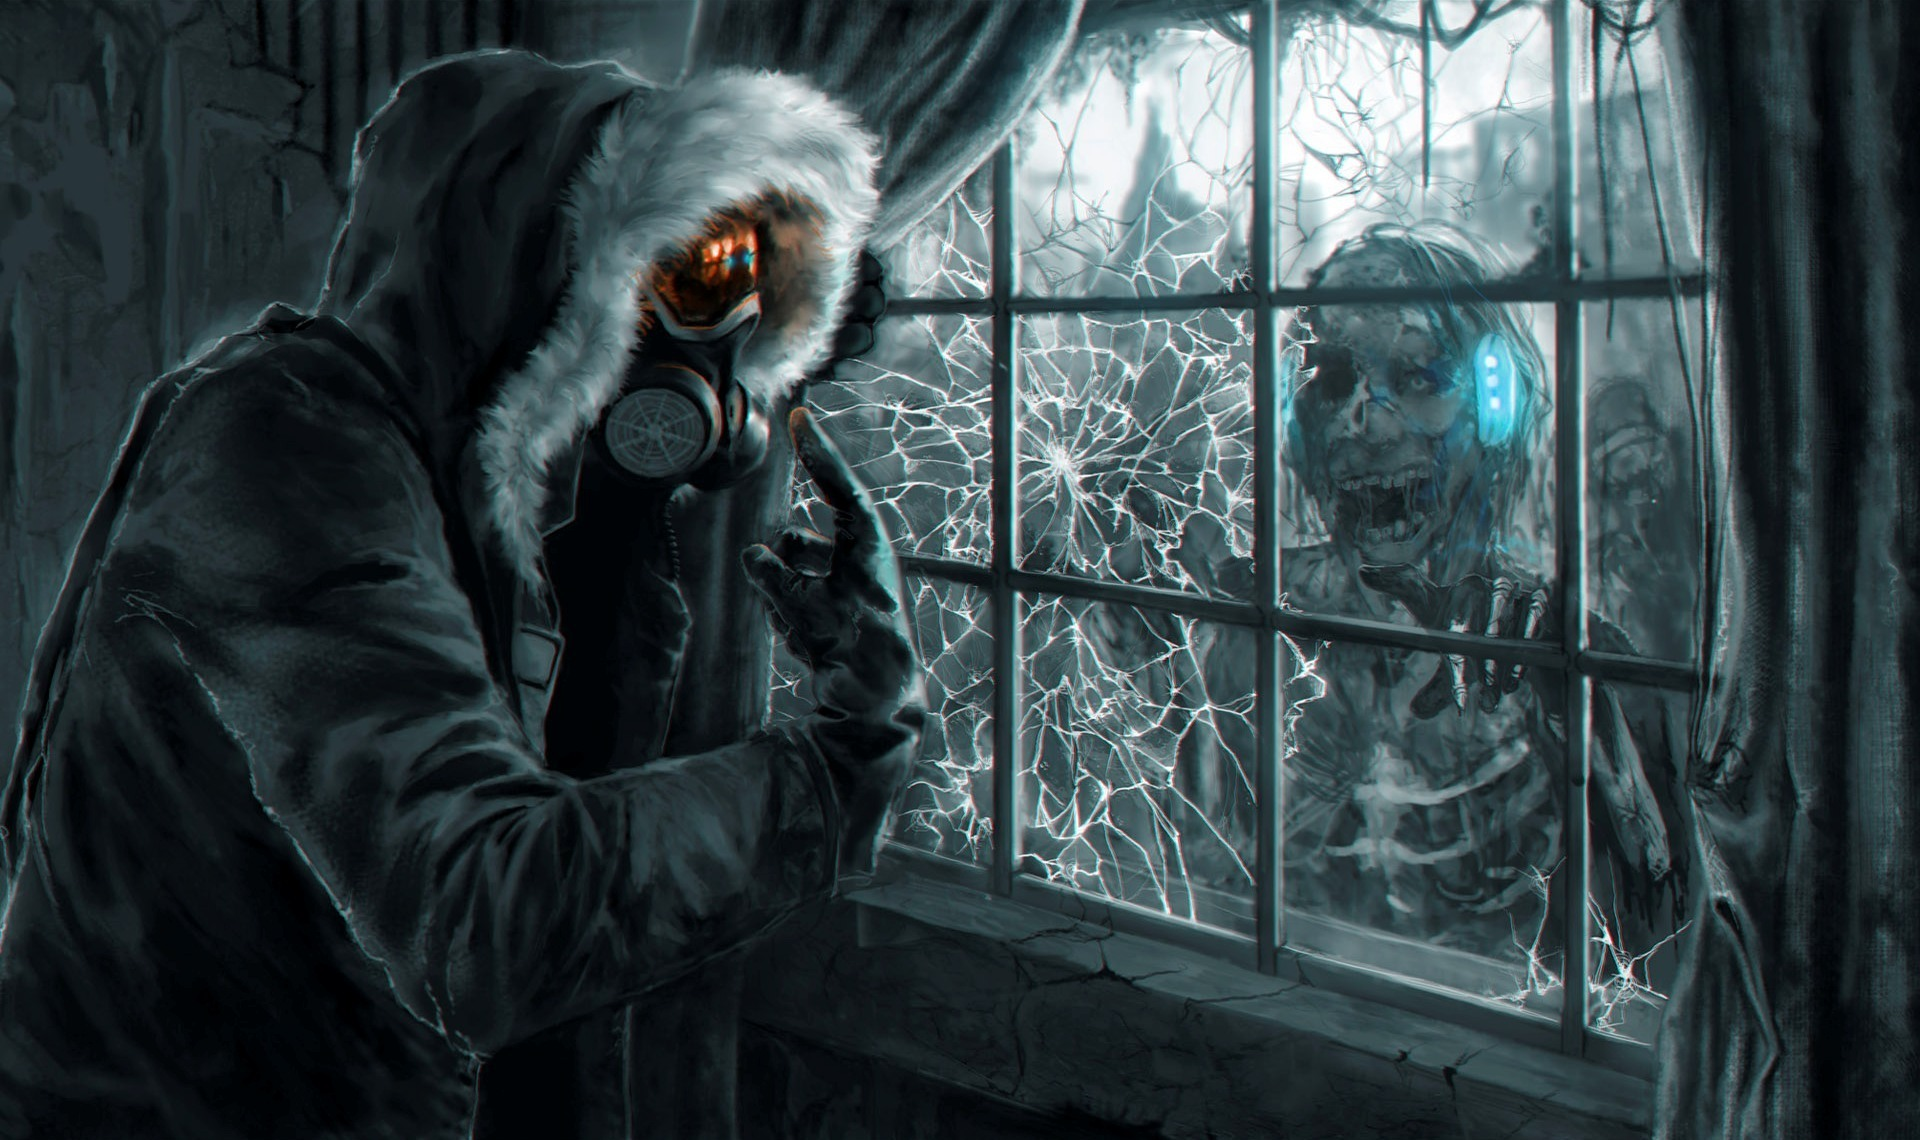 Christmas Zombie Wallpaper.Wallpaper Romantically Apocalyptic Zombie Heroes Comics